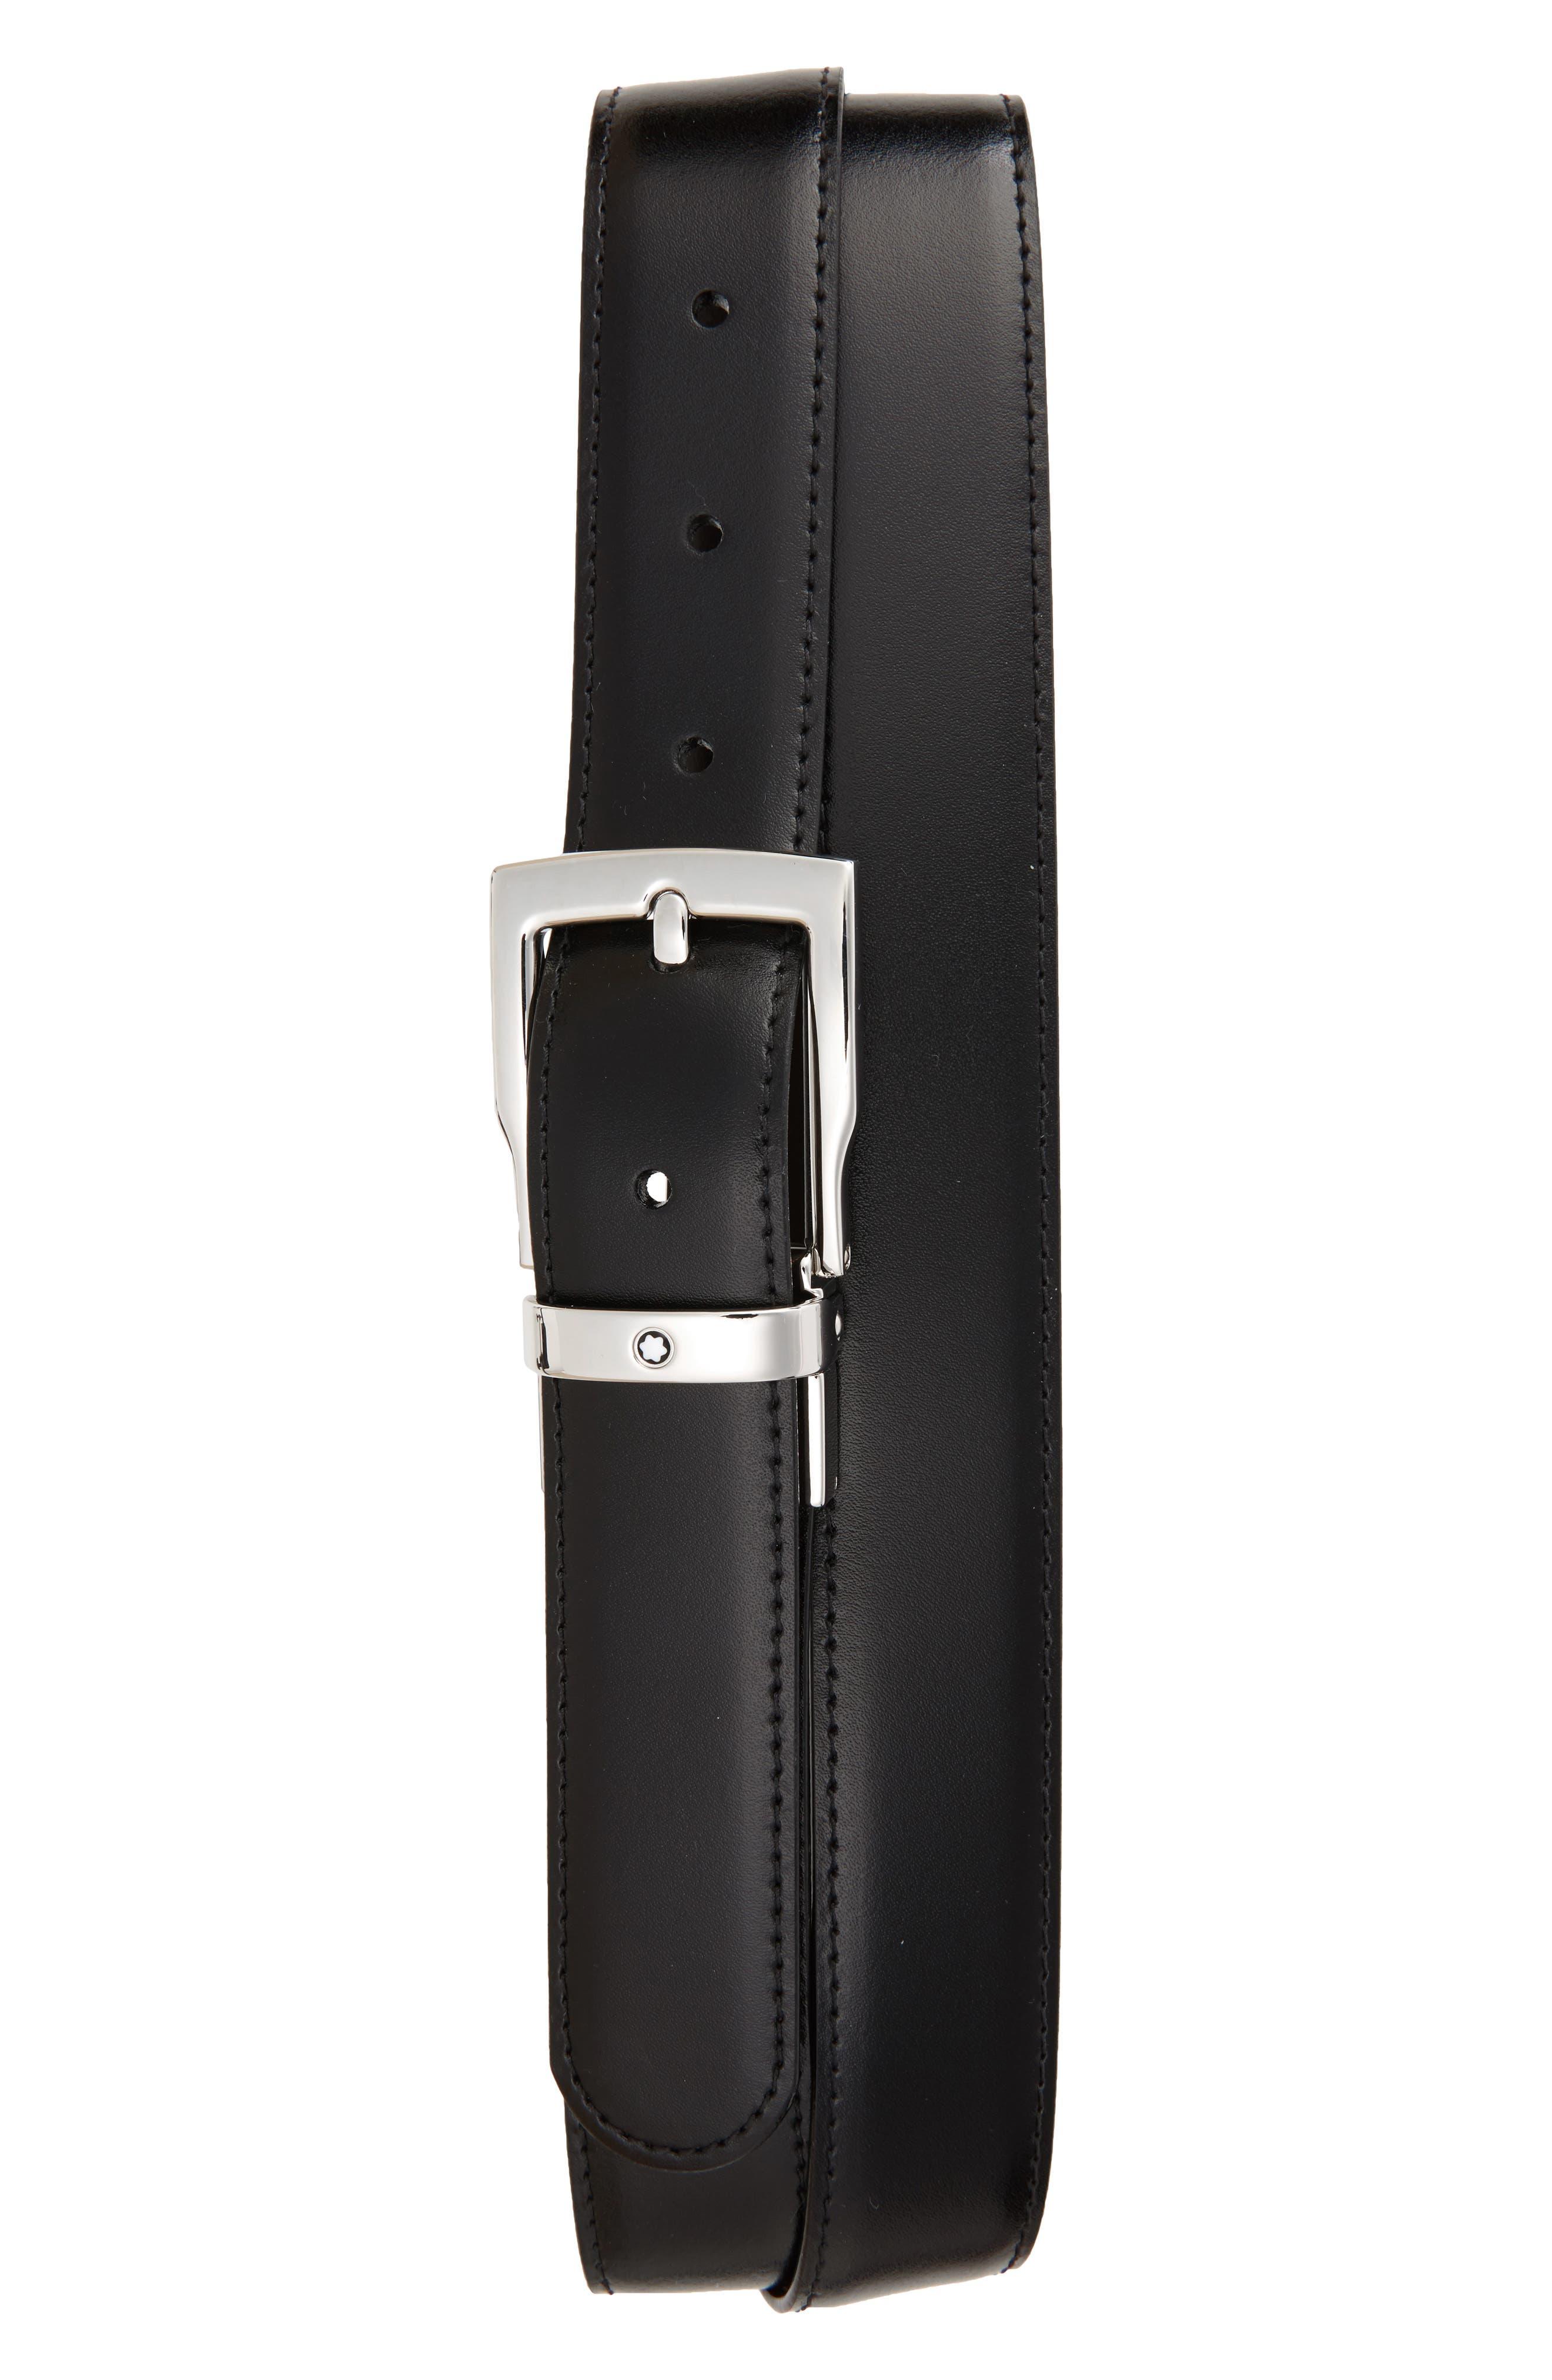 MONTBLANC, Square Buckle Reversible Leather Belt, Main thumbnail 1, color, BLACK/ BROWN